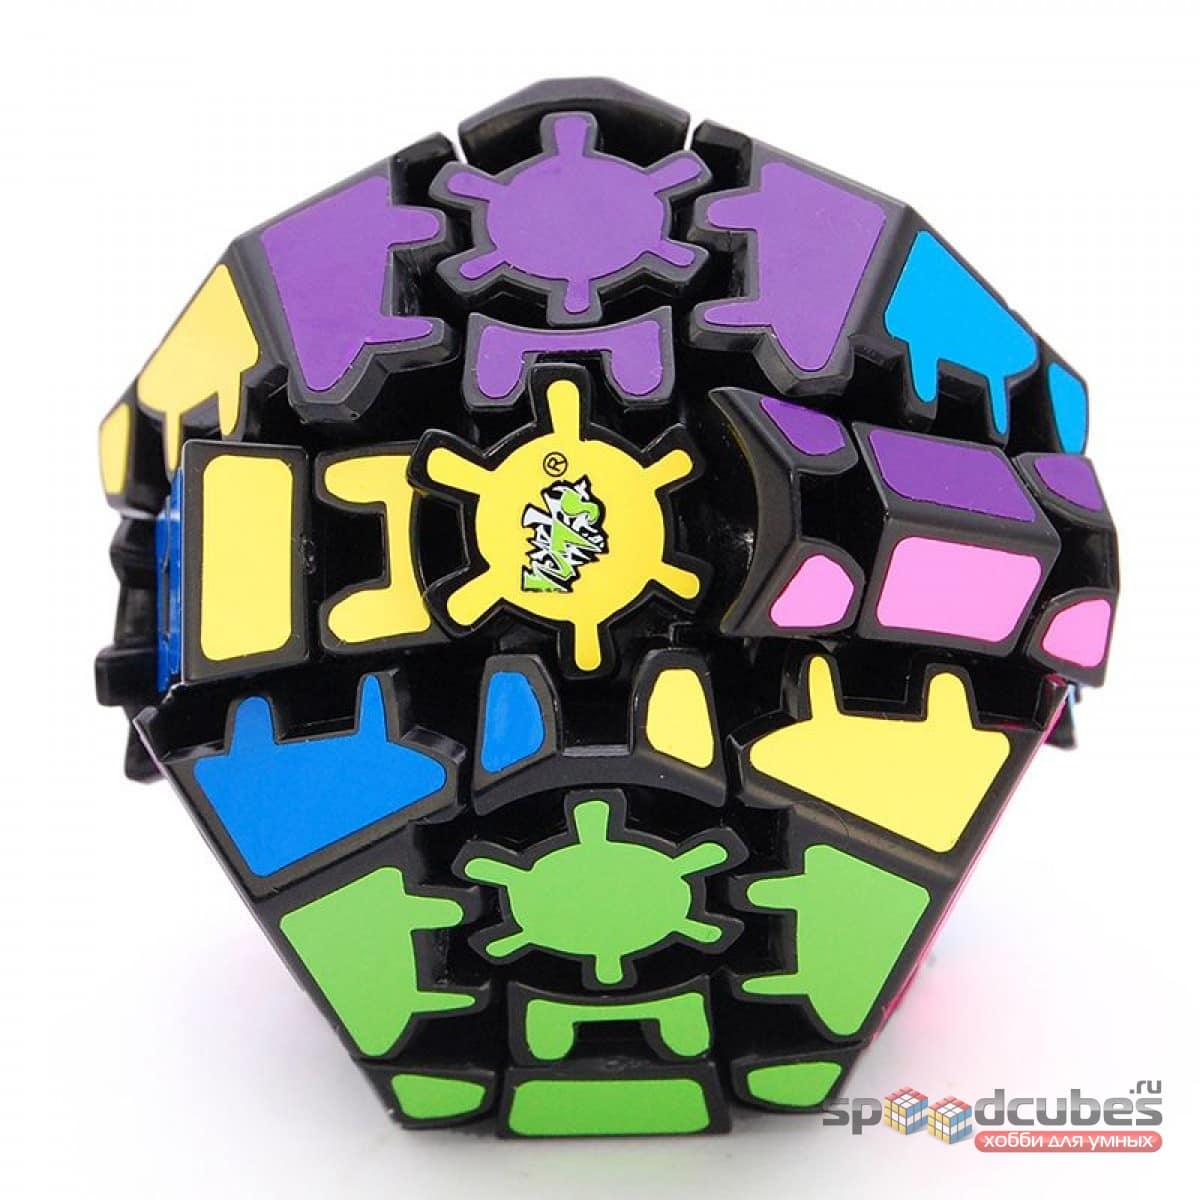 Lanlan Gear Dodecahedron 1